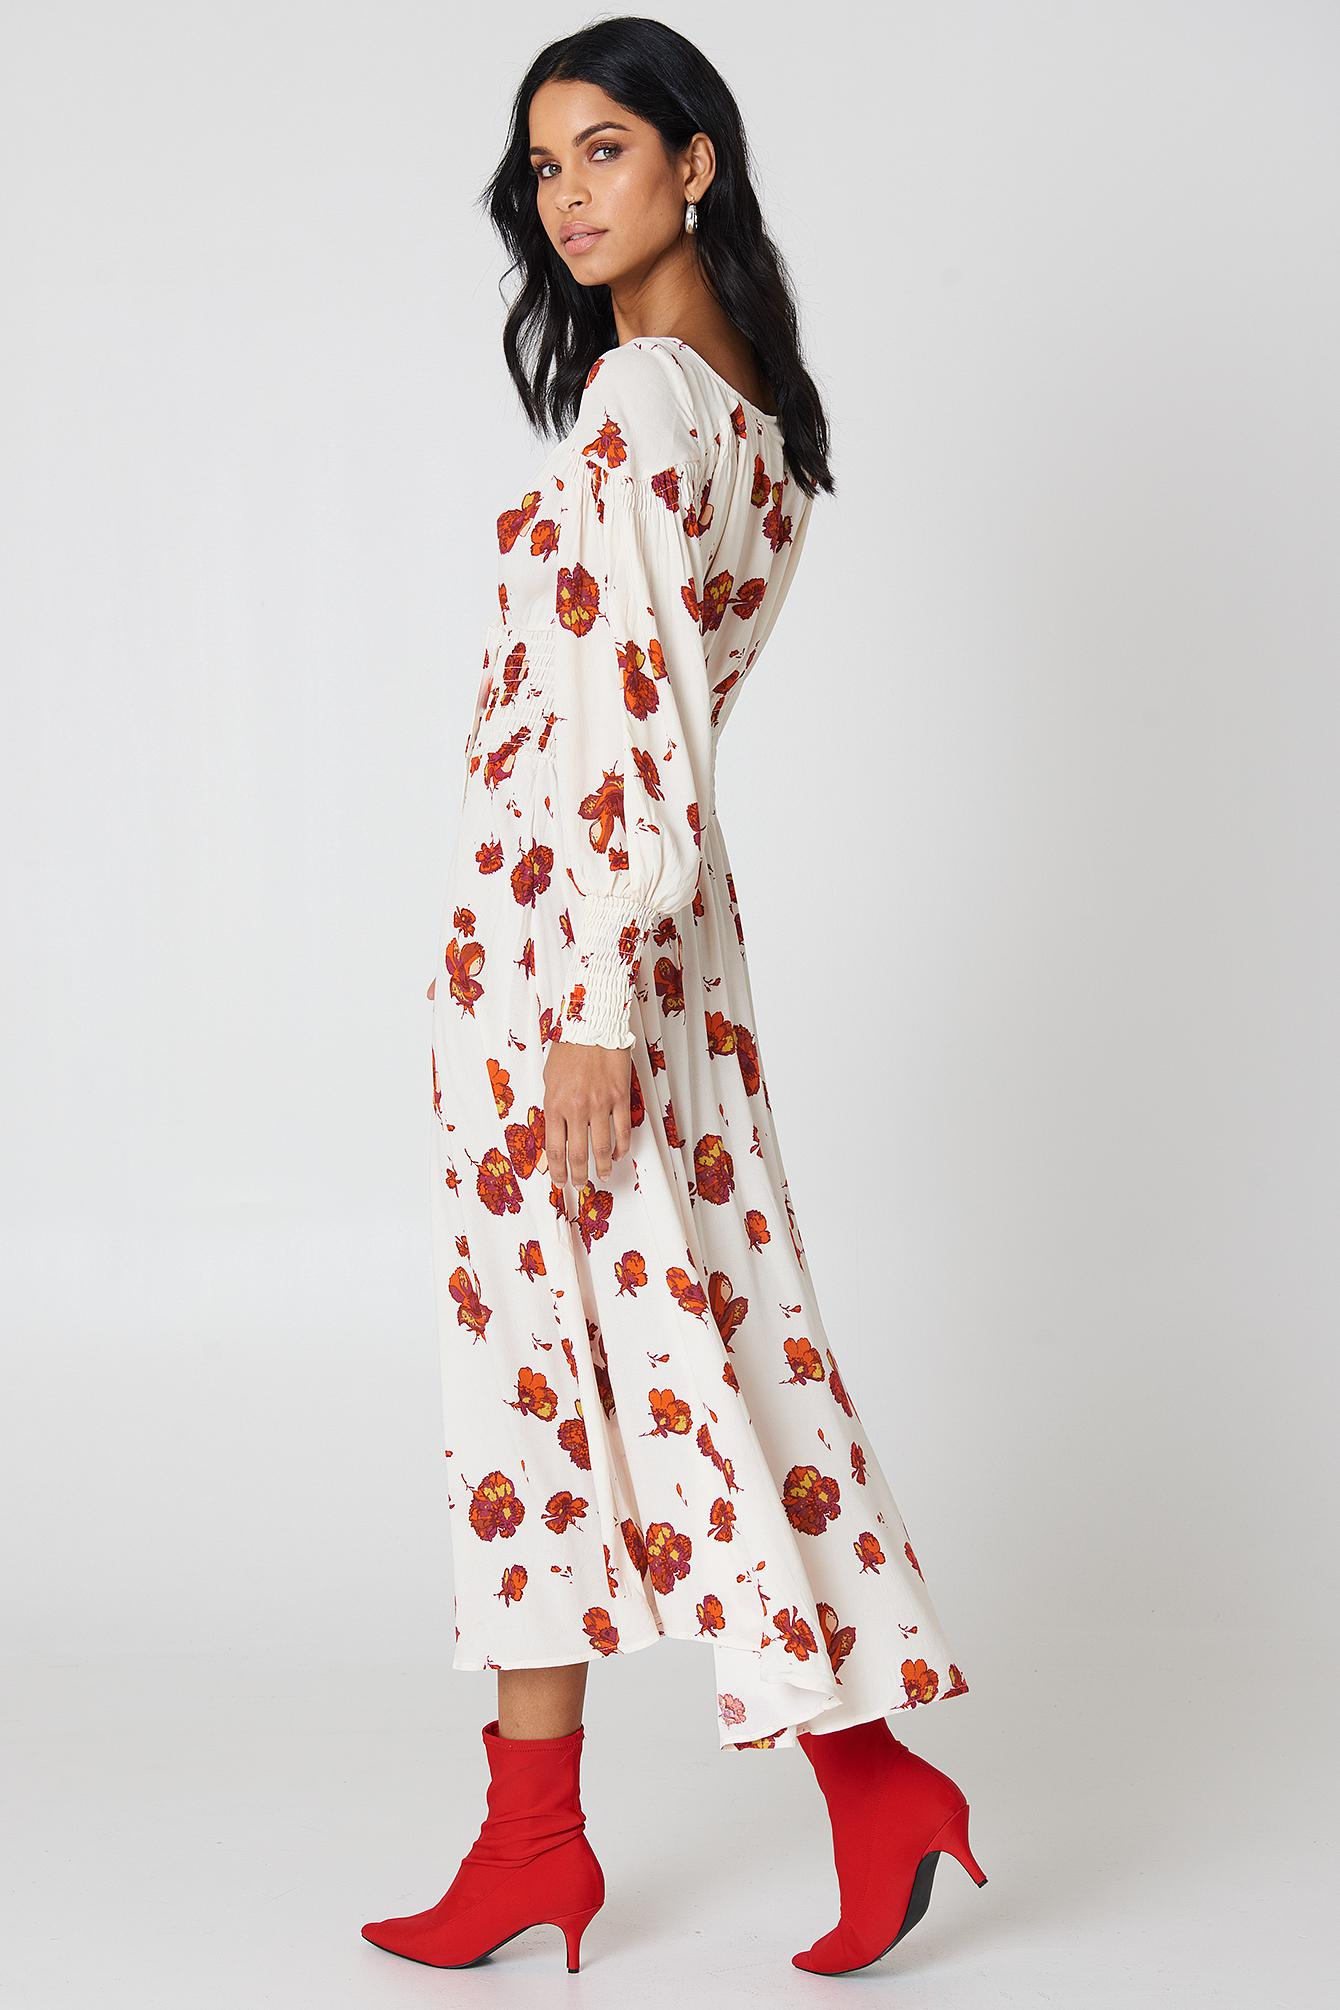 Cheap Sale Nicekicks So Sweetly Mutton Sleeve Midi Dress - Ivory Free People Low Shipping Fee Sale Online Wholesale Online Ik48ACon